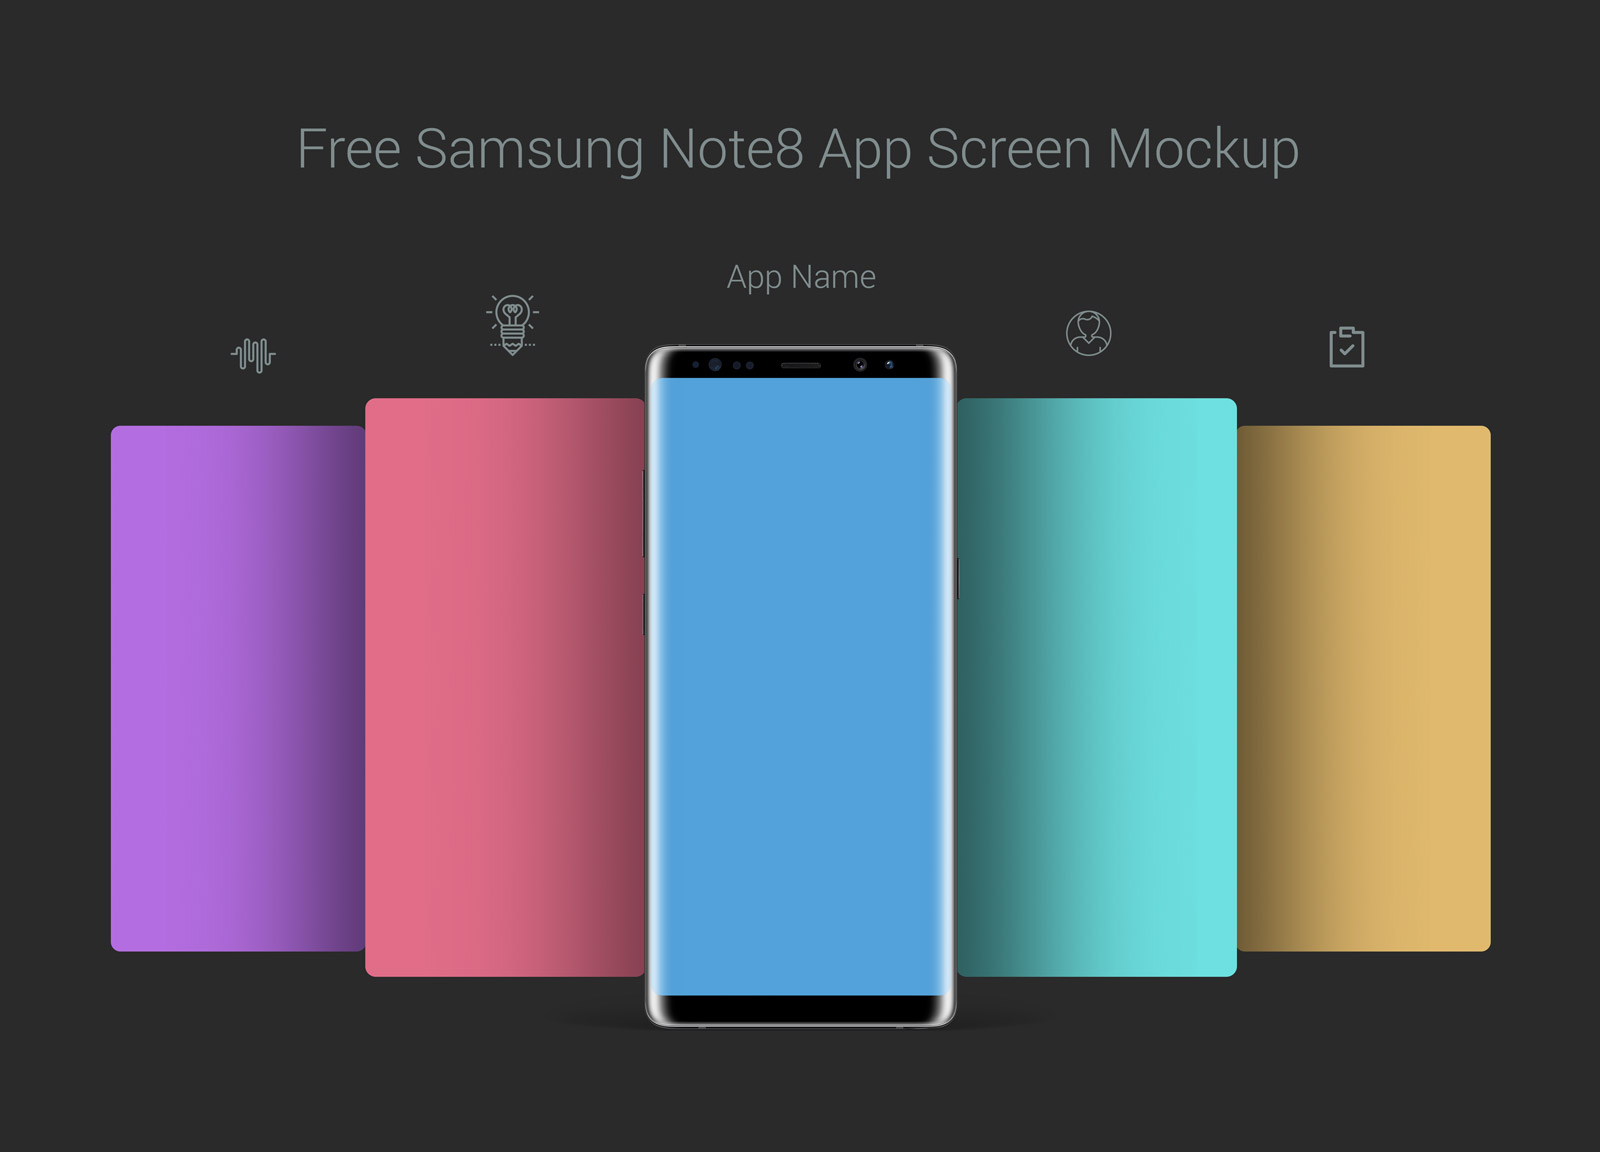 Free-Samsung-Galaxy-Note8-App-Screen-Mockup-PSD-2